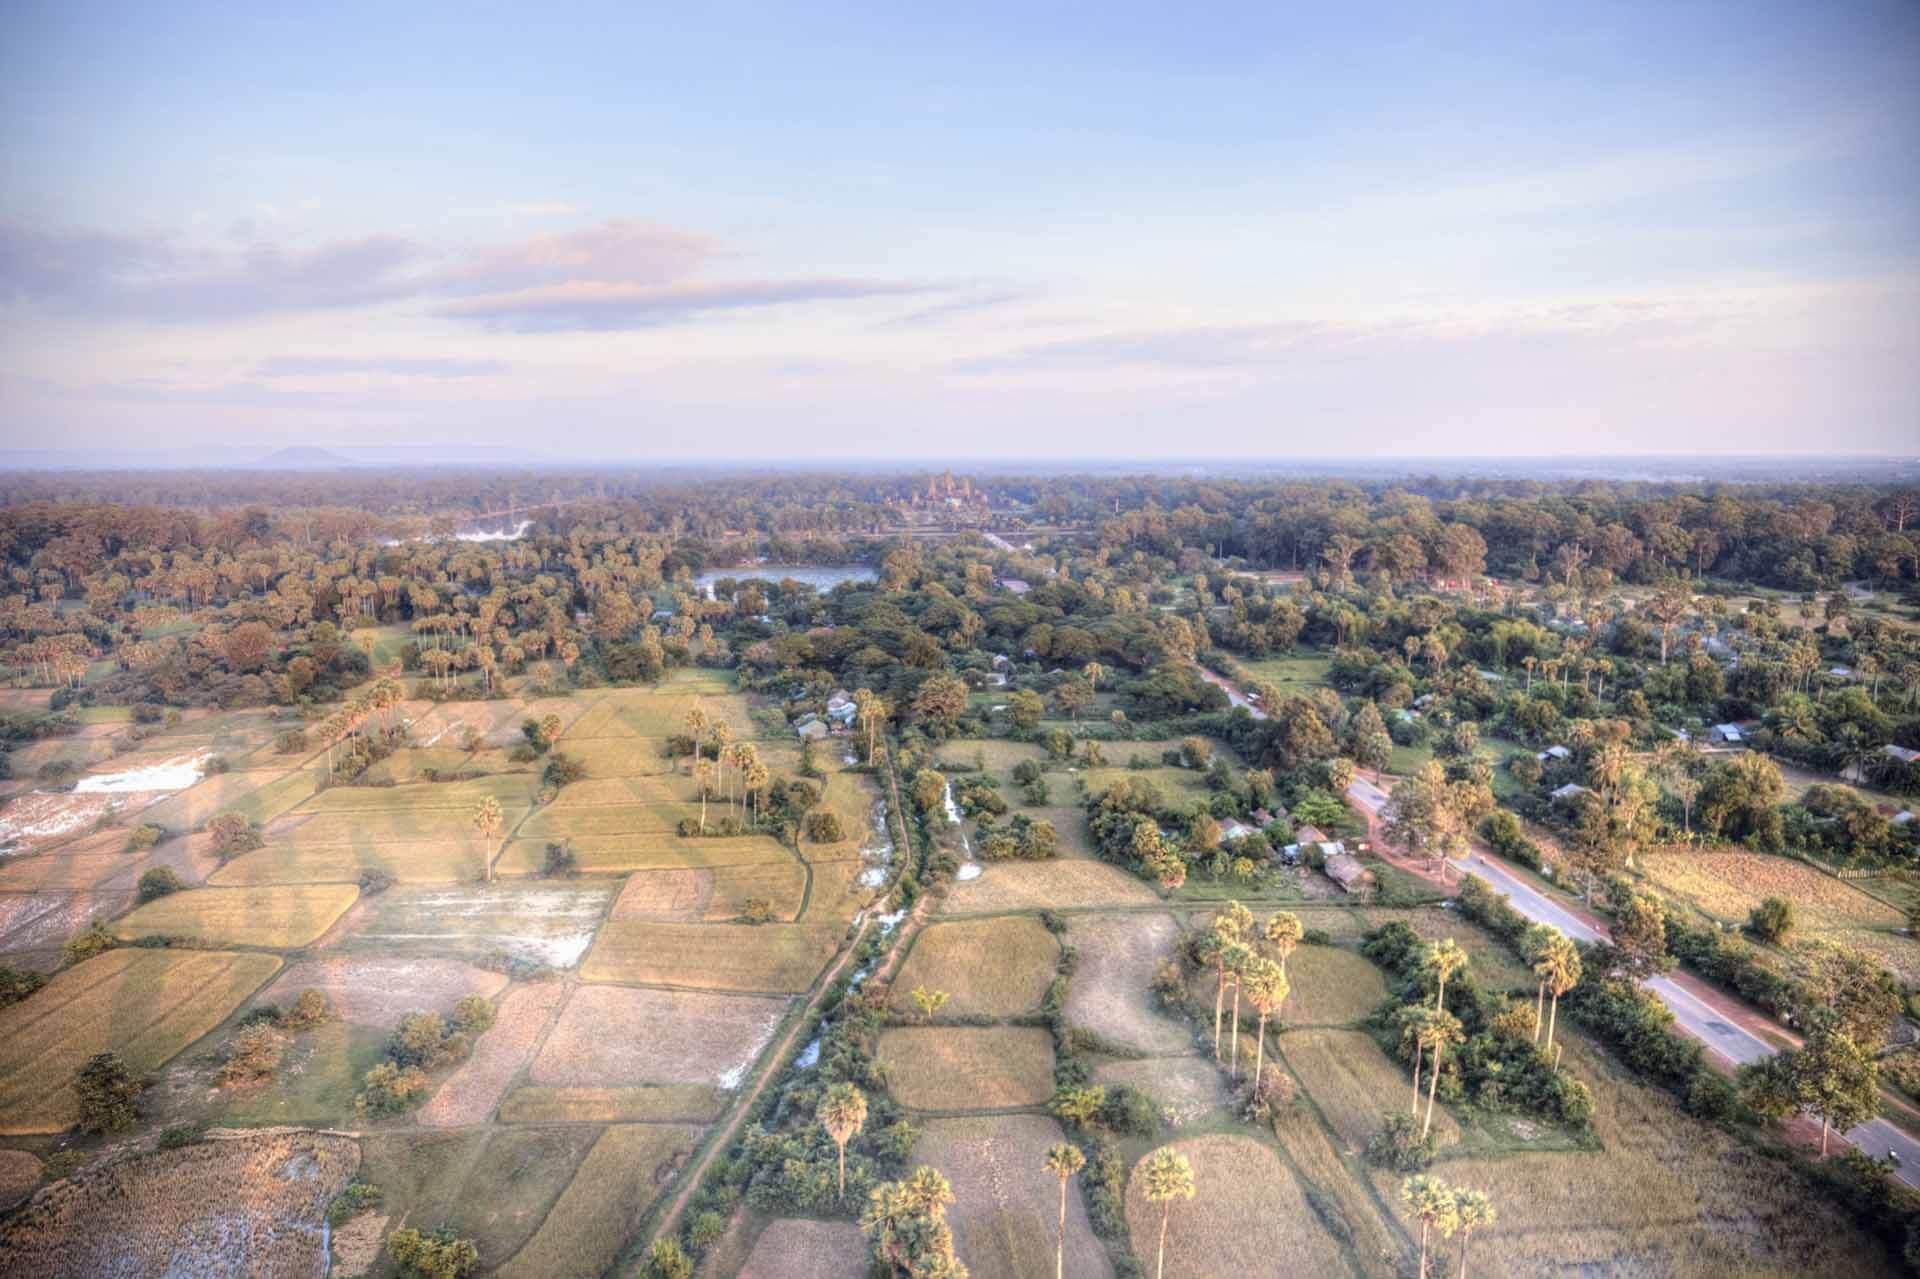 Kambodscha_Angkor_039